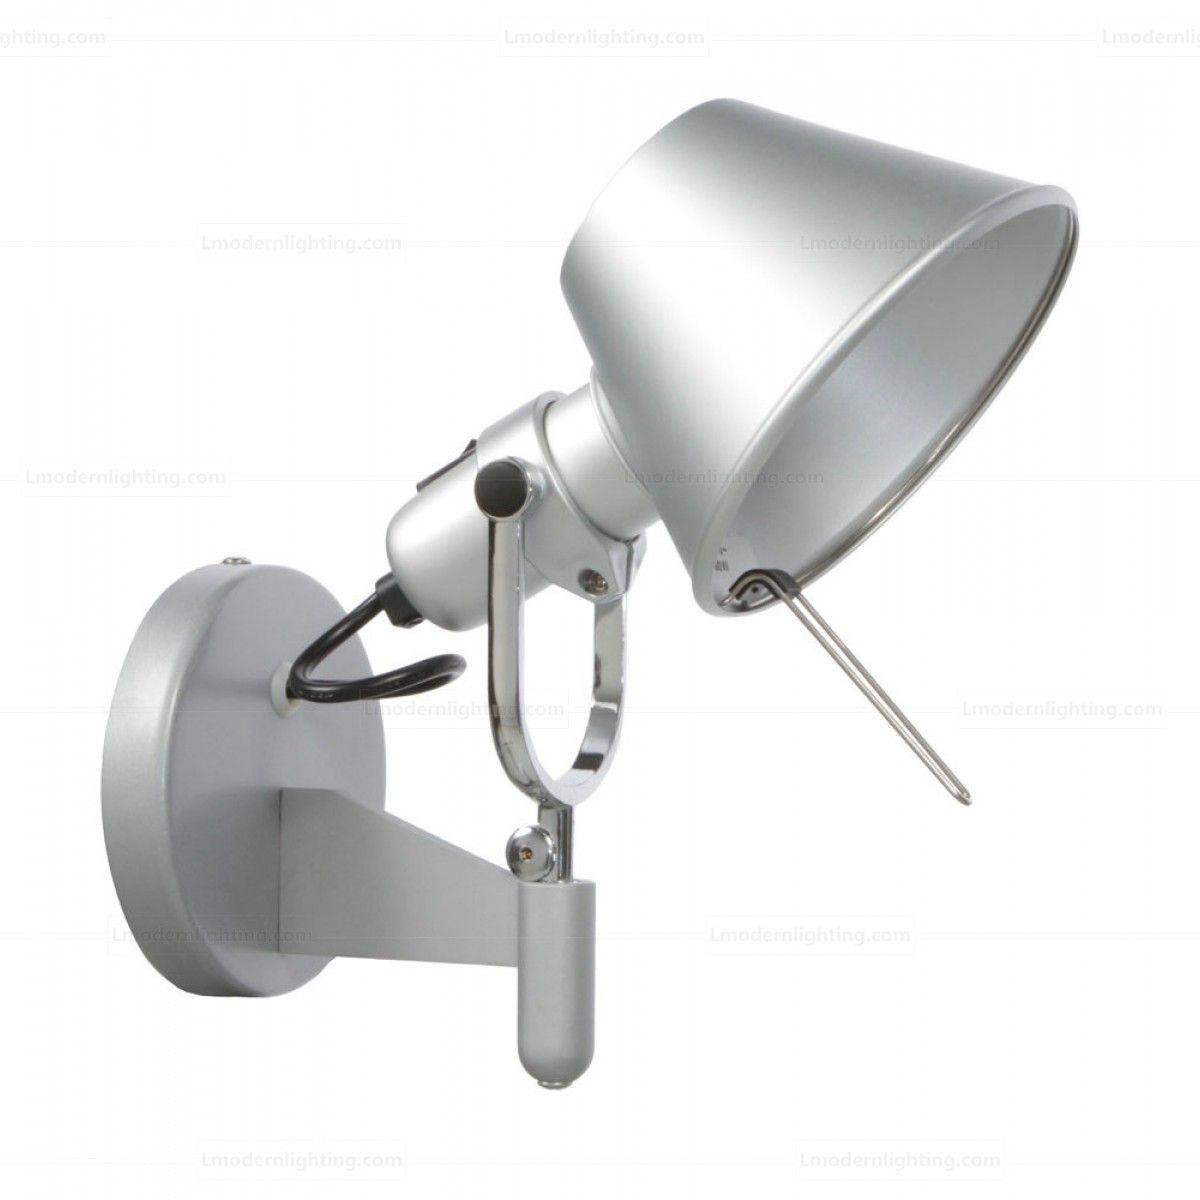 Tolomeo Faretto Wall Light Wall Lamp Tolomeo Wall Lamp Lamp